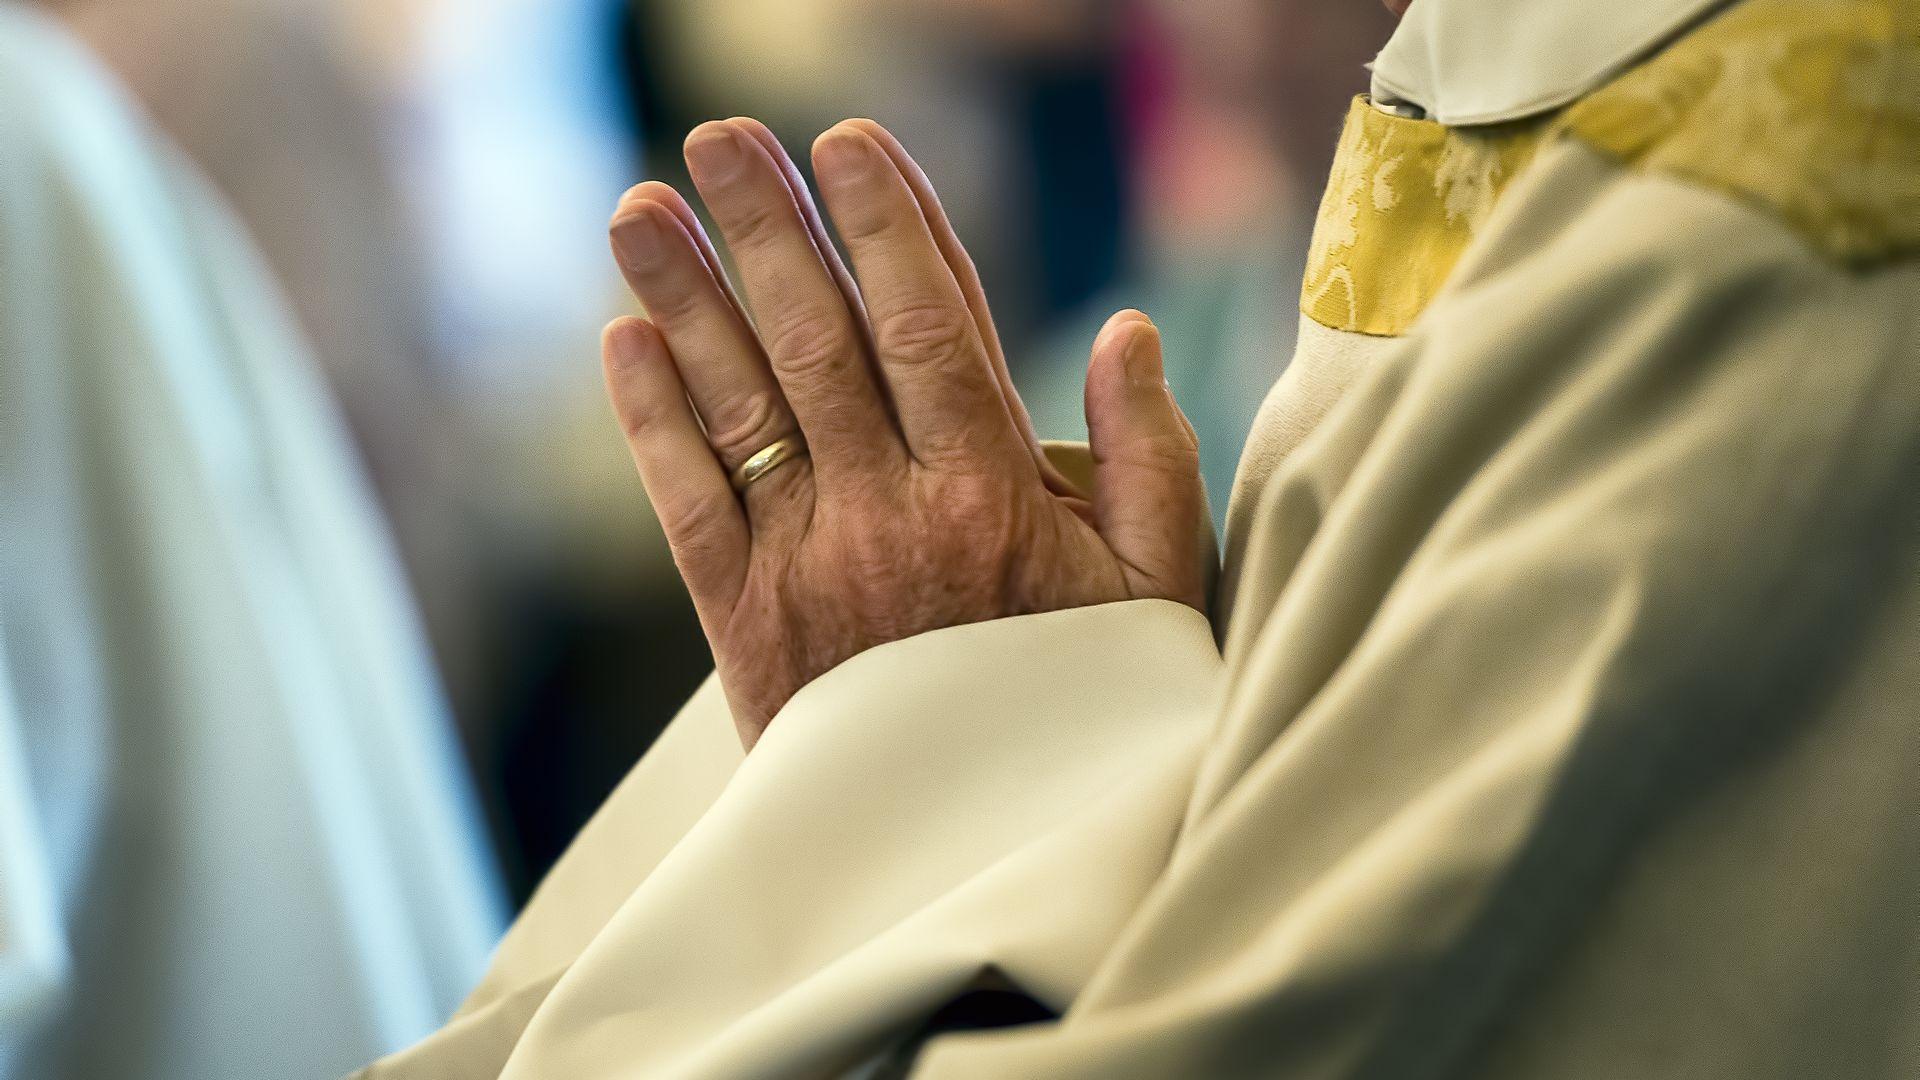 A priest's hands in prayer